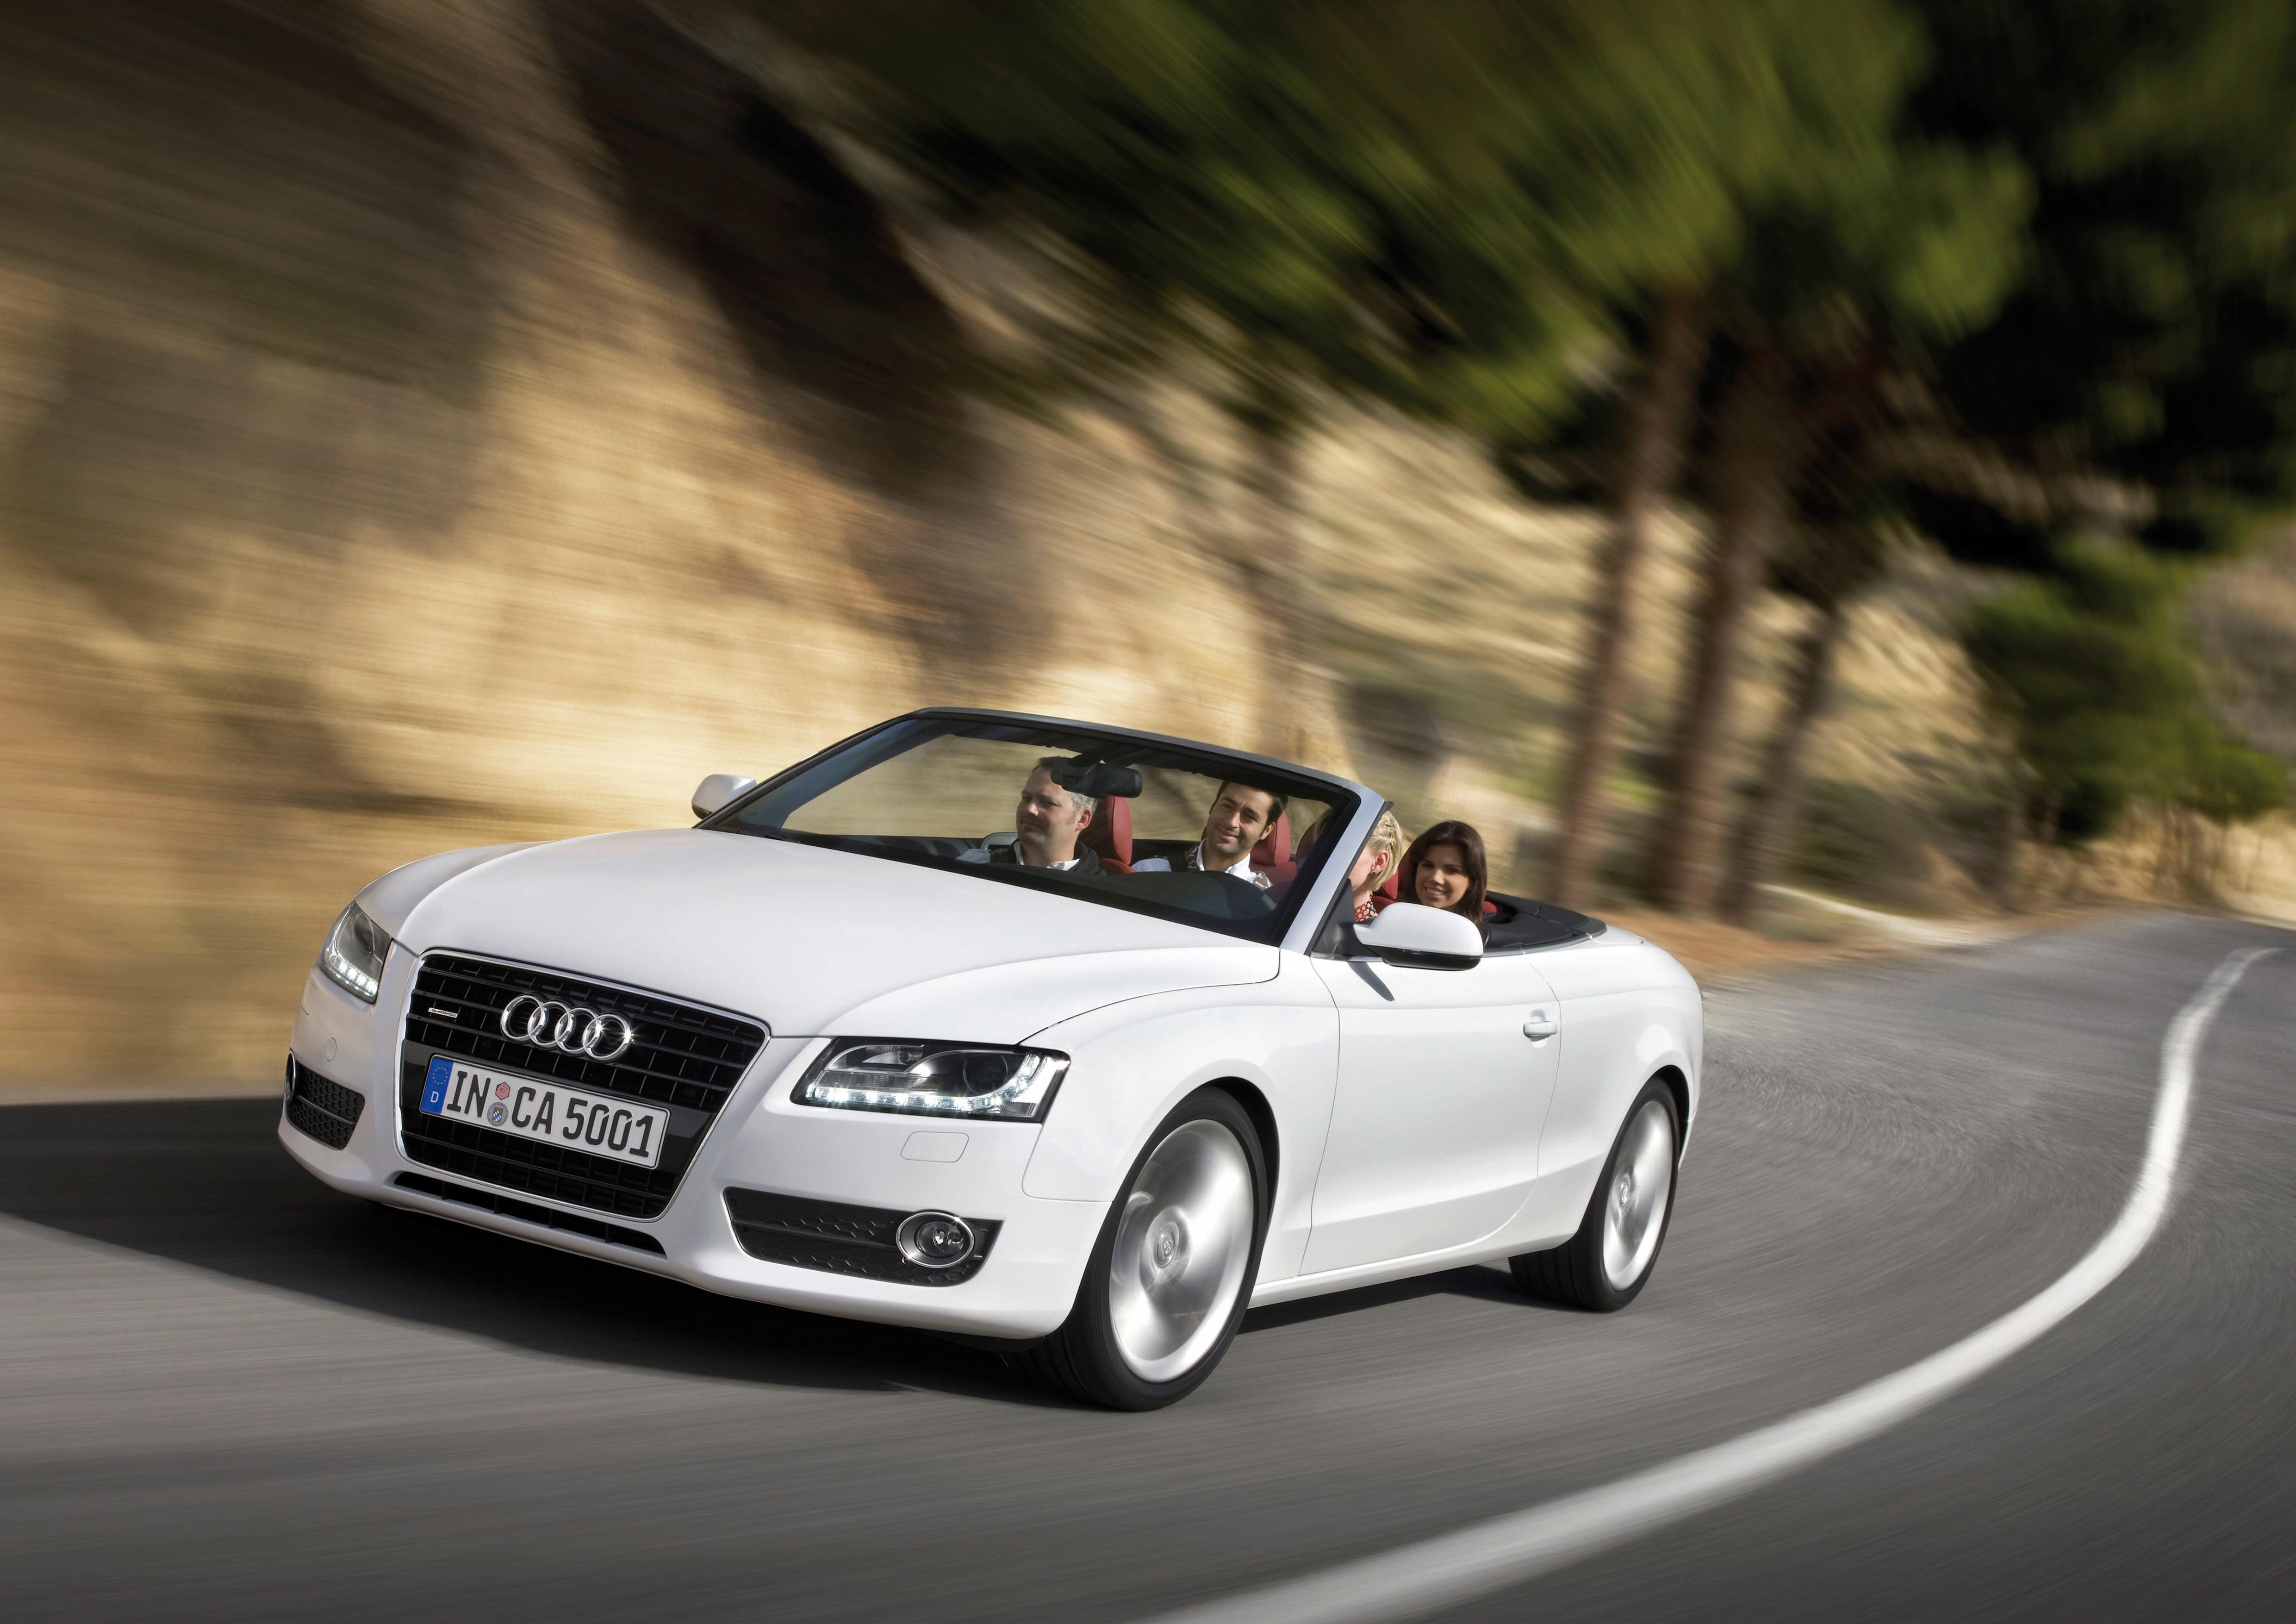 Audi A5 Cabriolet/Fahraufnahme